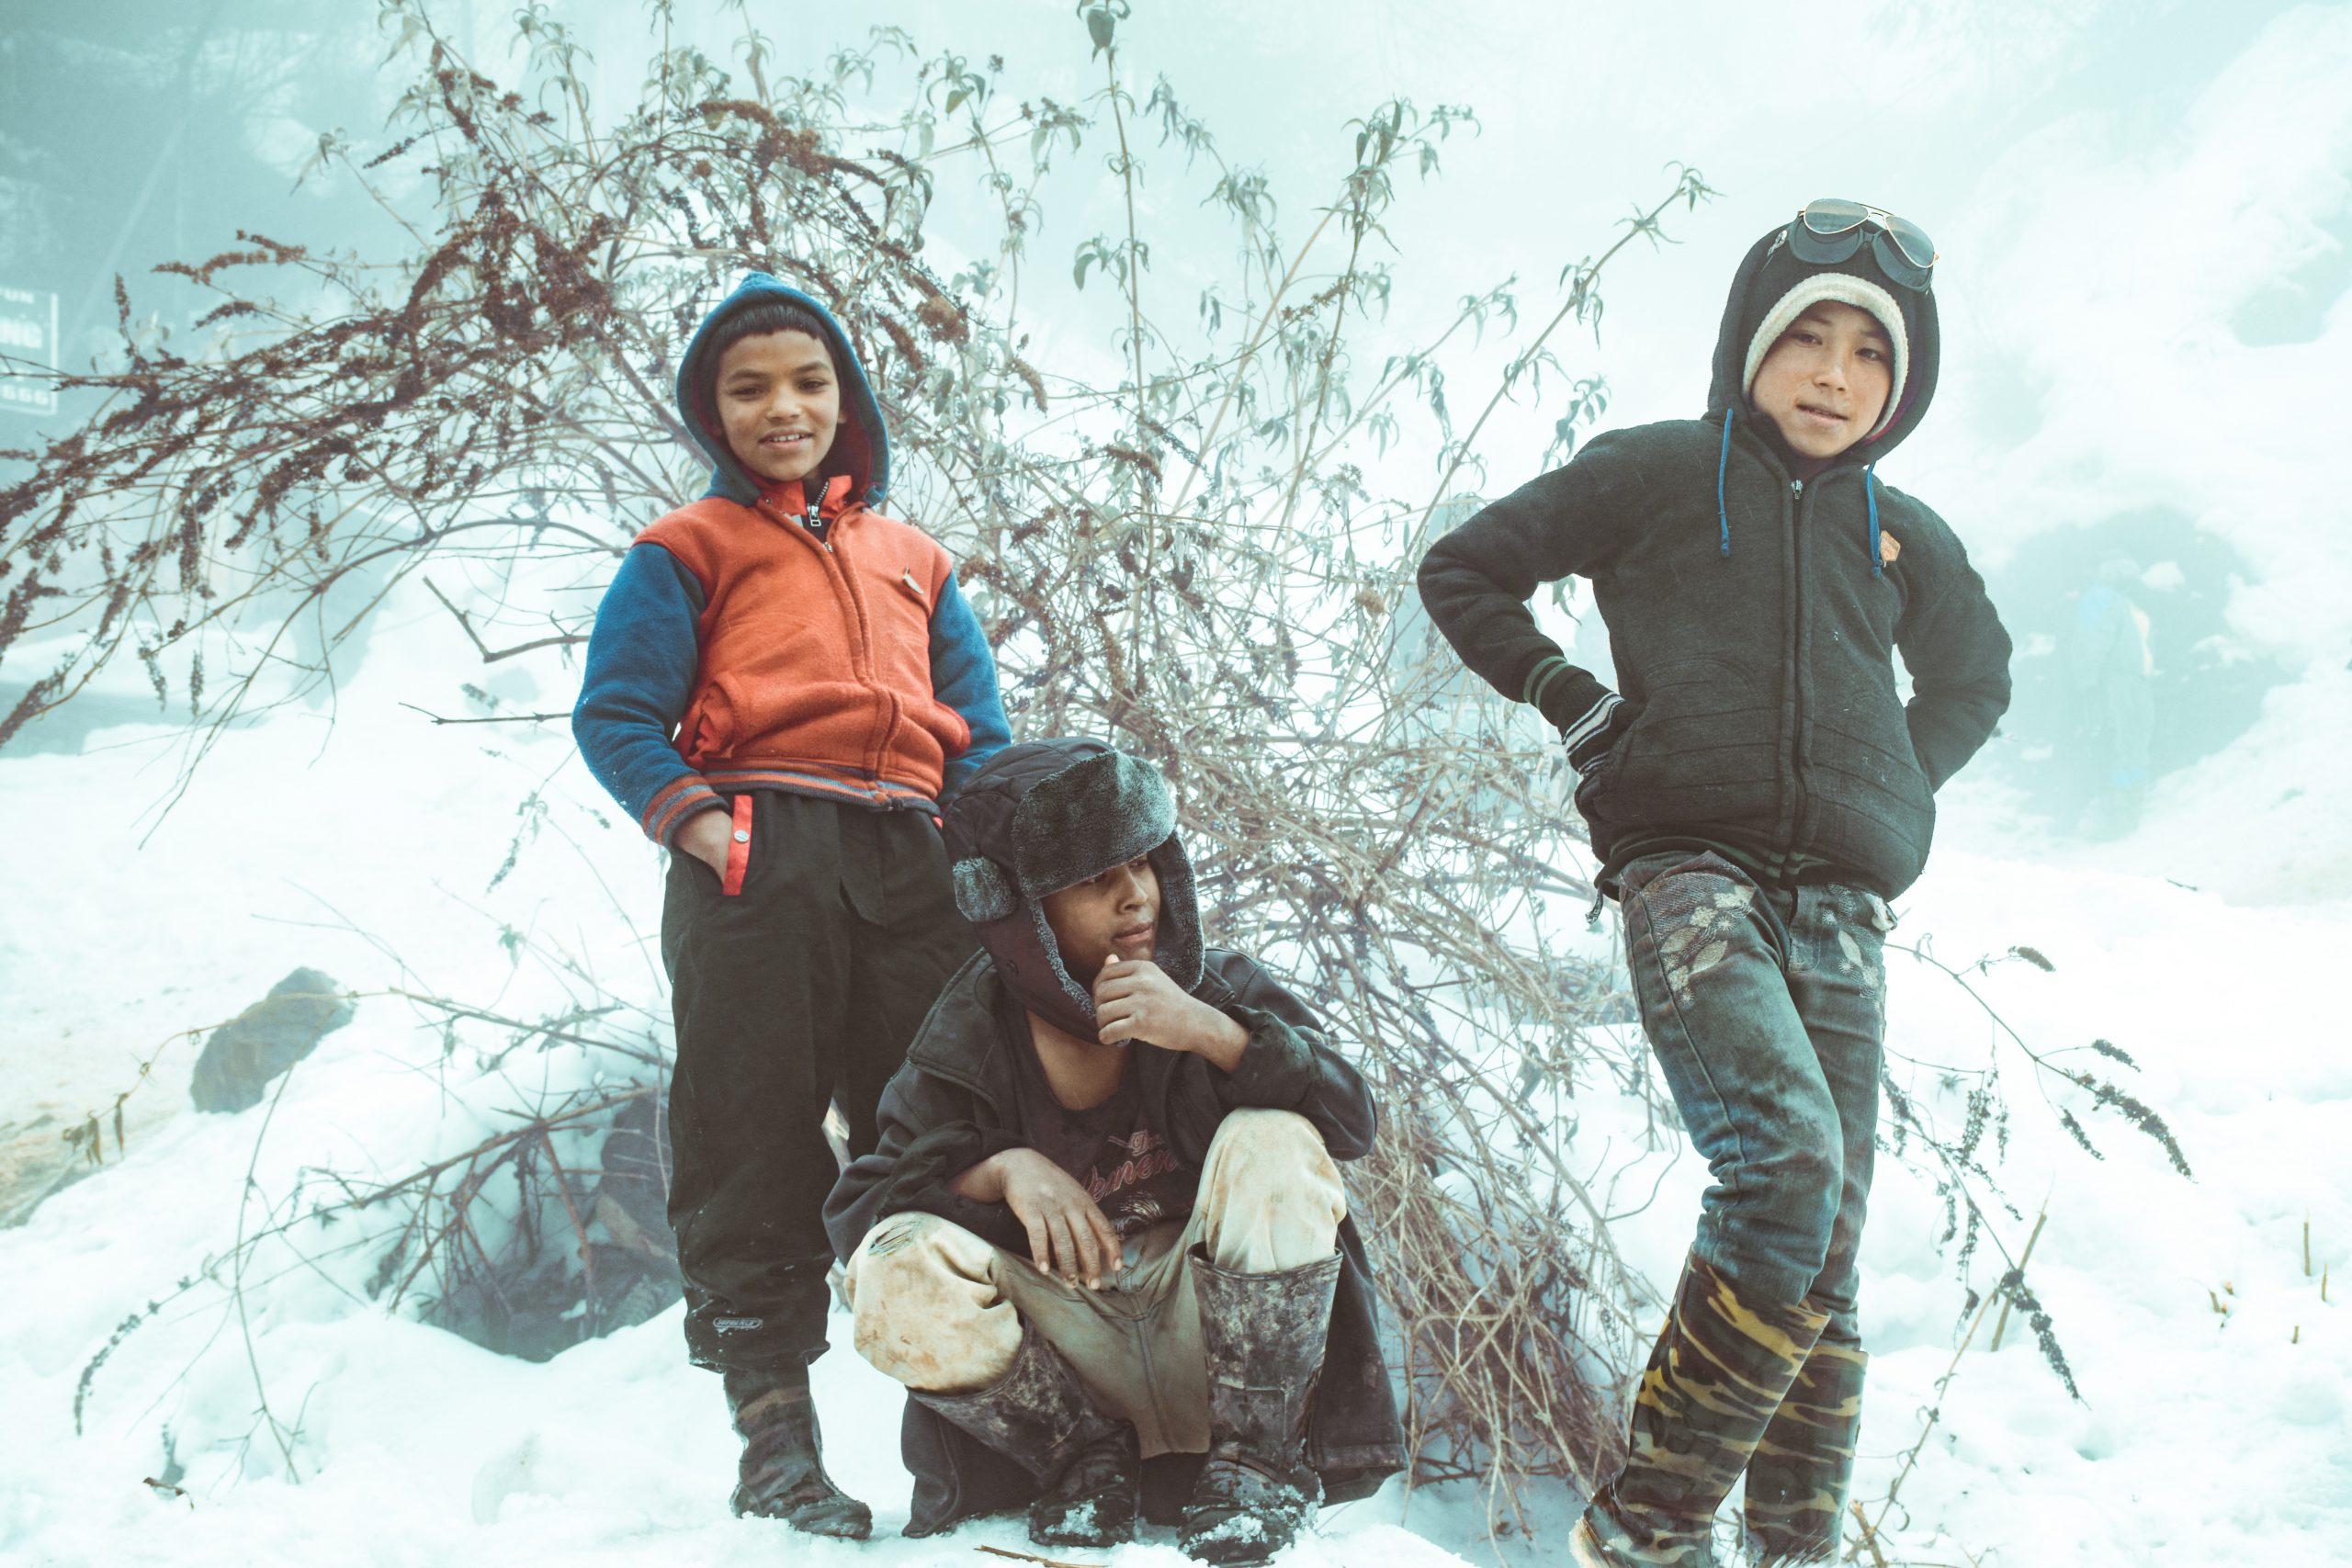 Children of the hills.